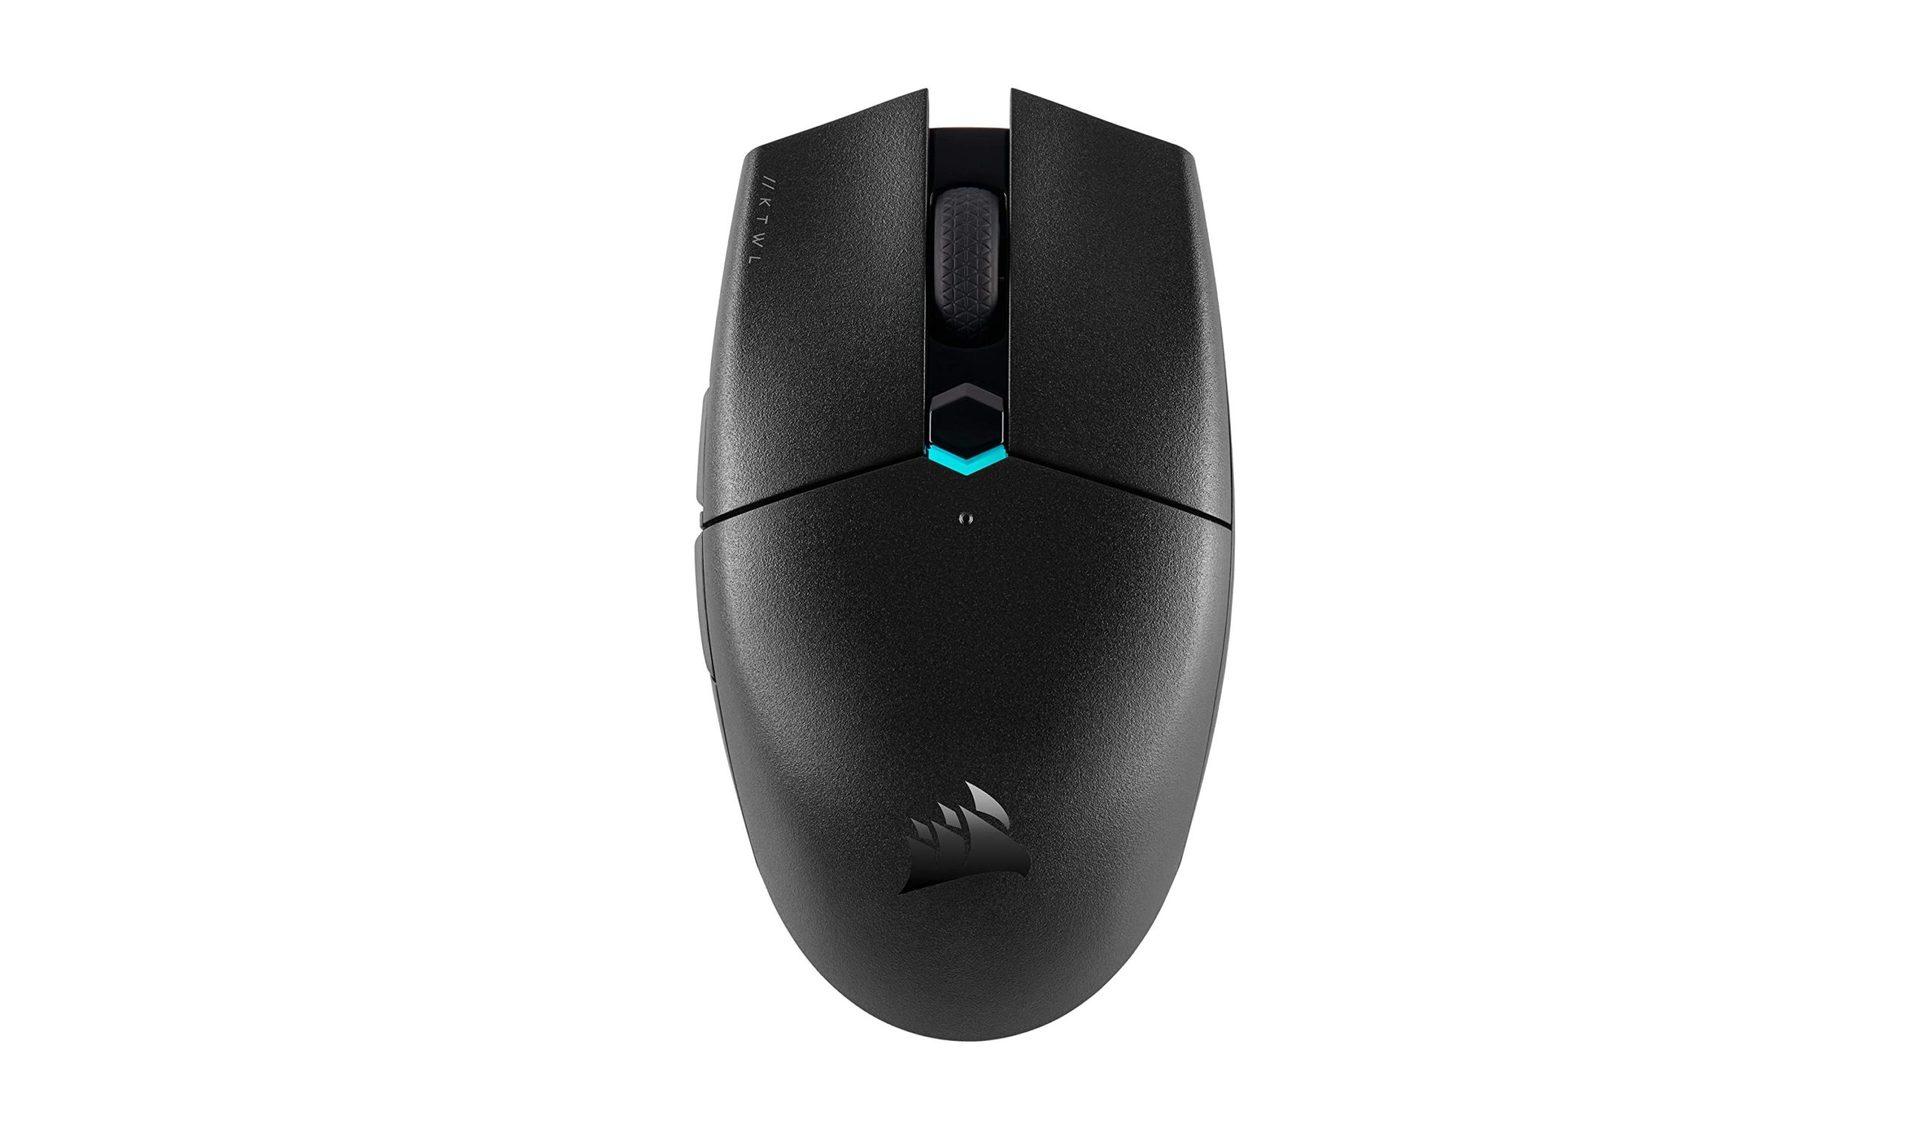 Corsair Katar Pro Wireless mouse on a white background